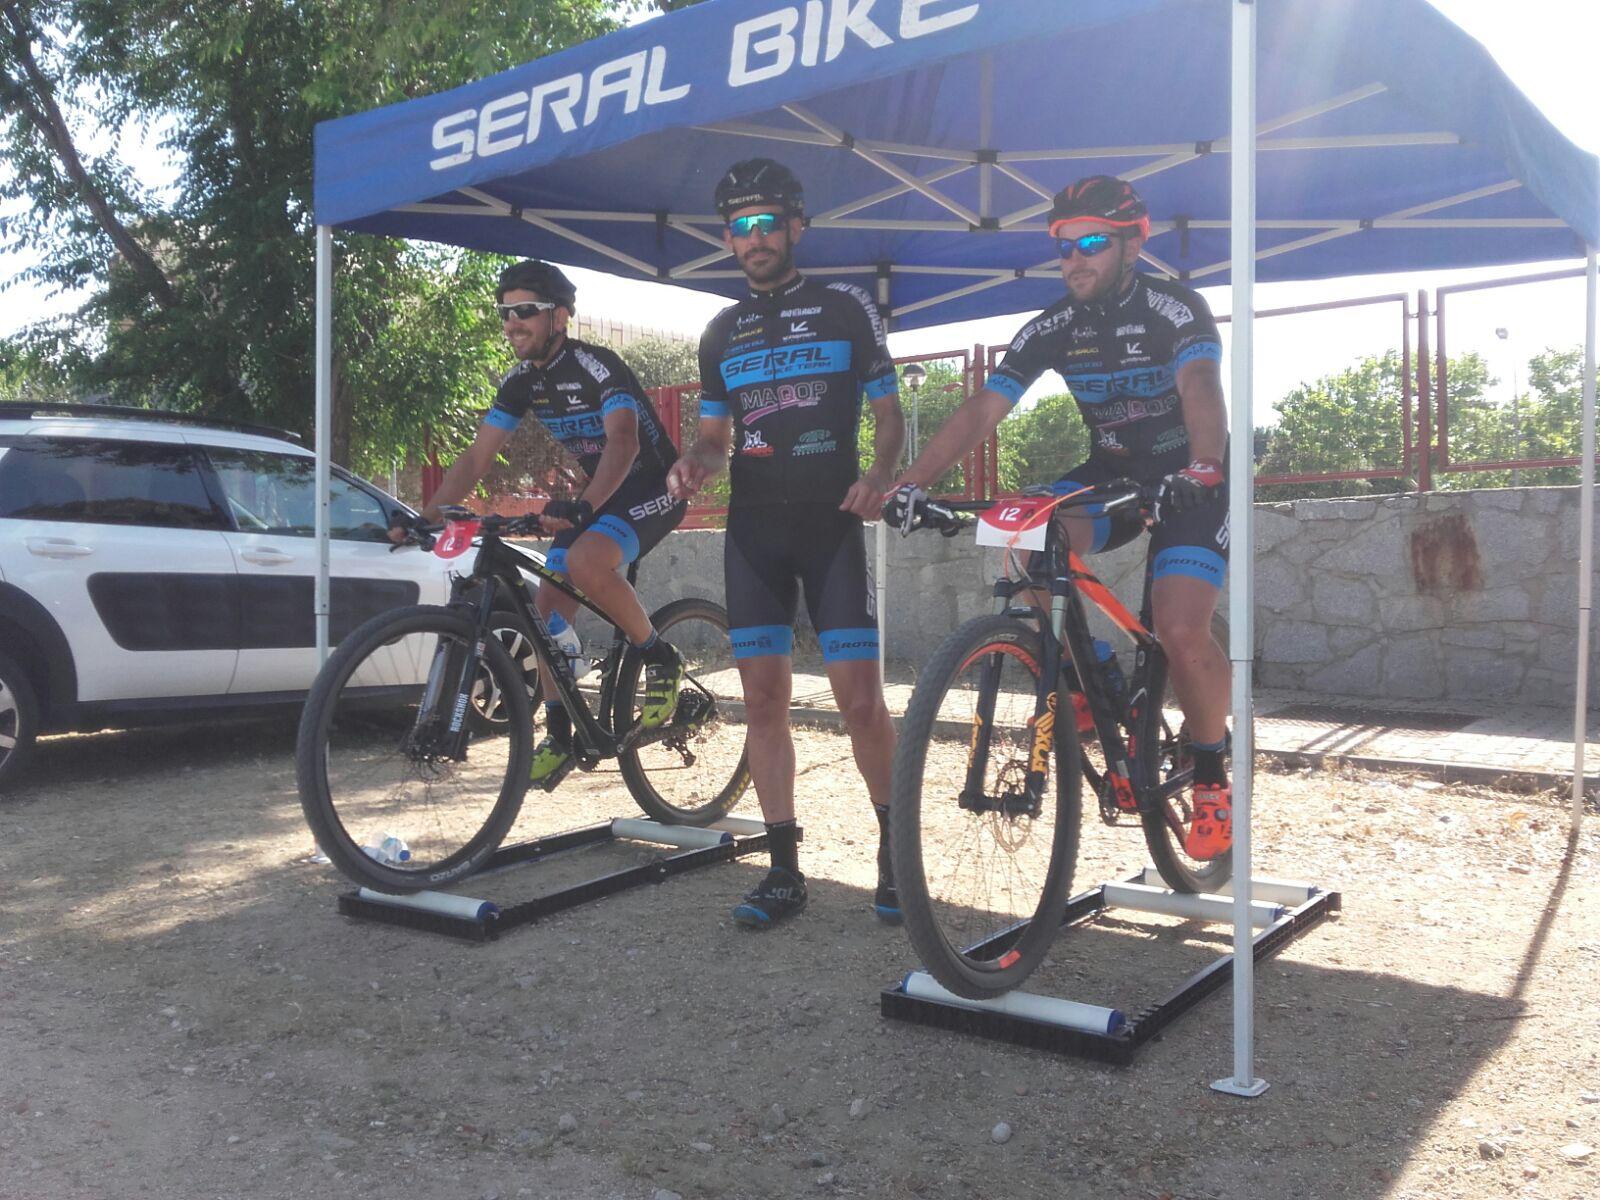 Circuito Xco Moralzarzal : Seral bike: 2017